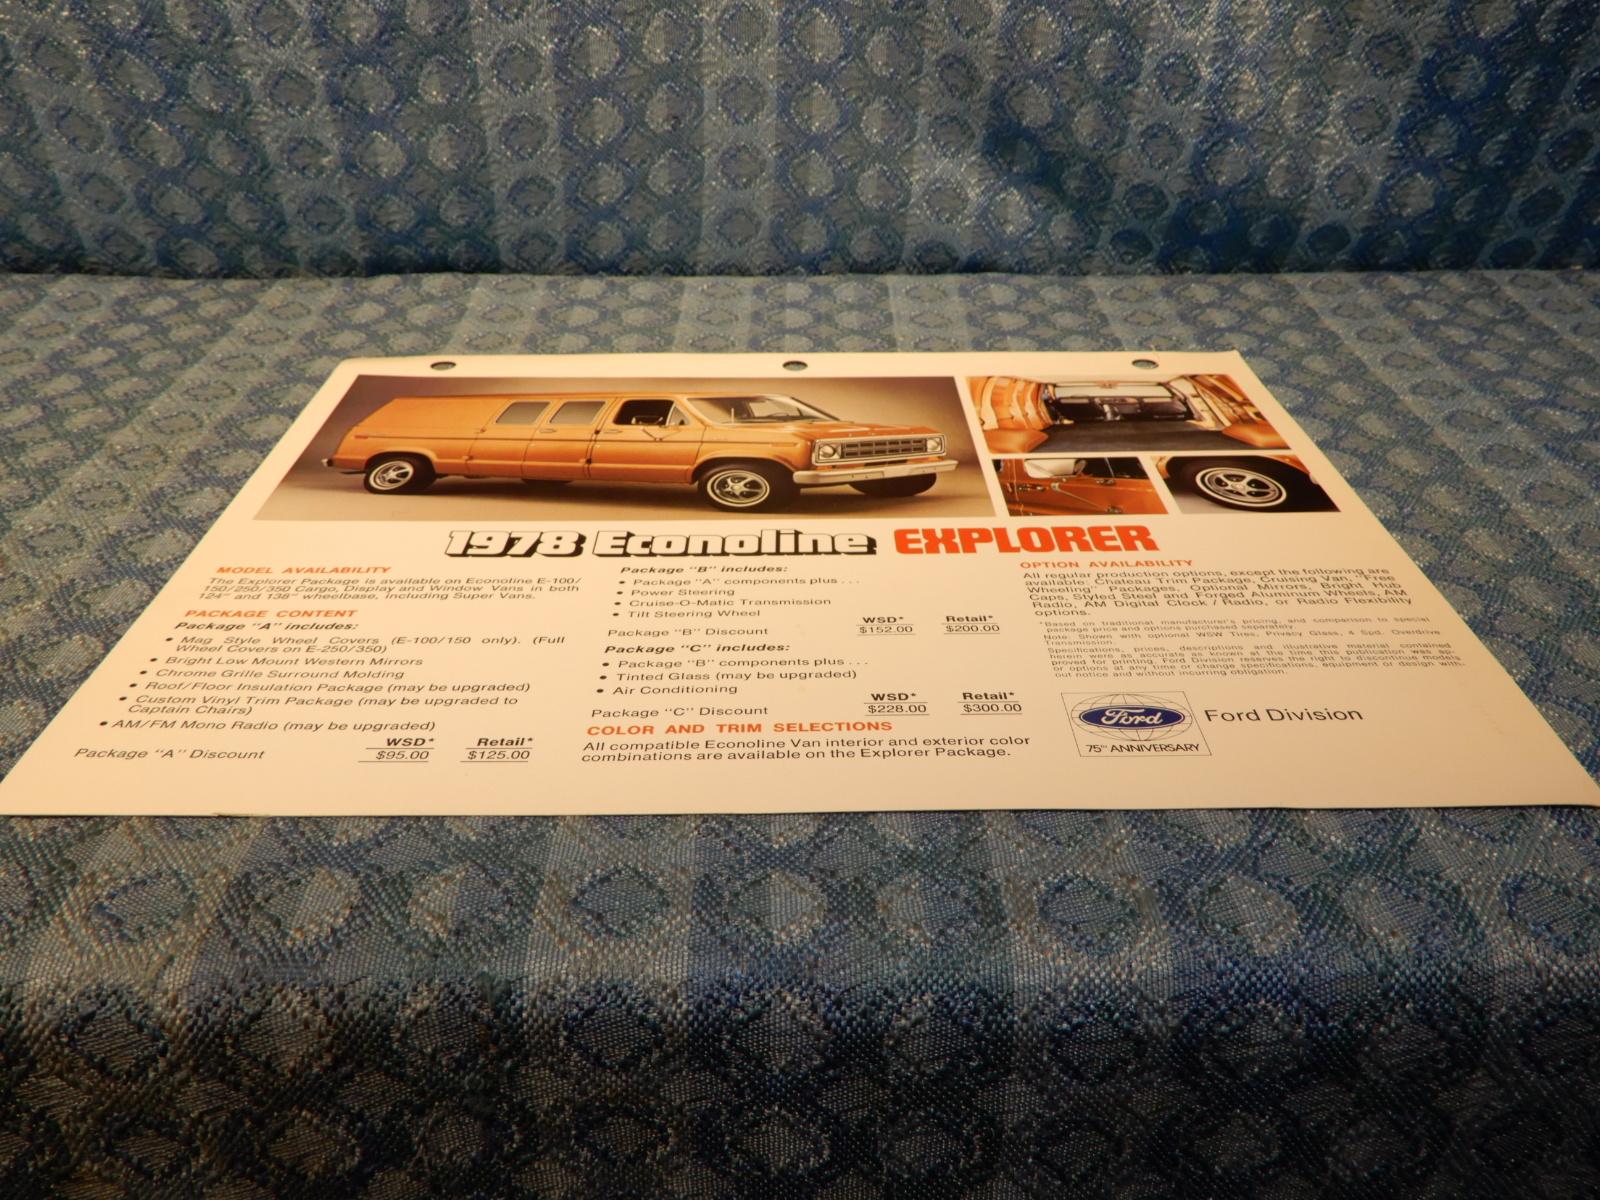 1978 Ford Econoline Explorer Van Original Dealer Sales Card